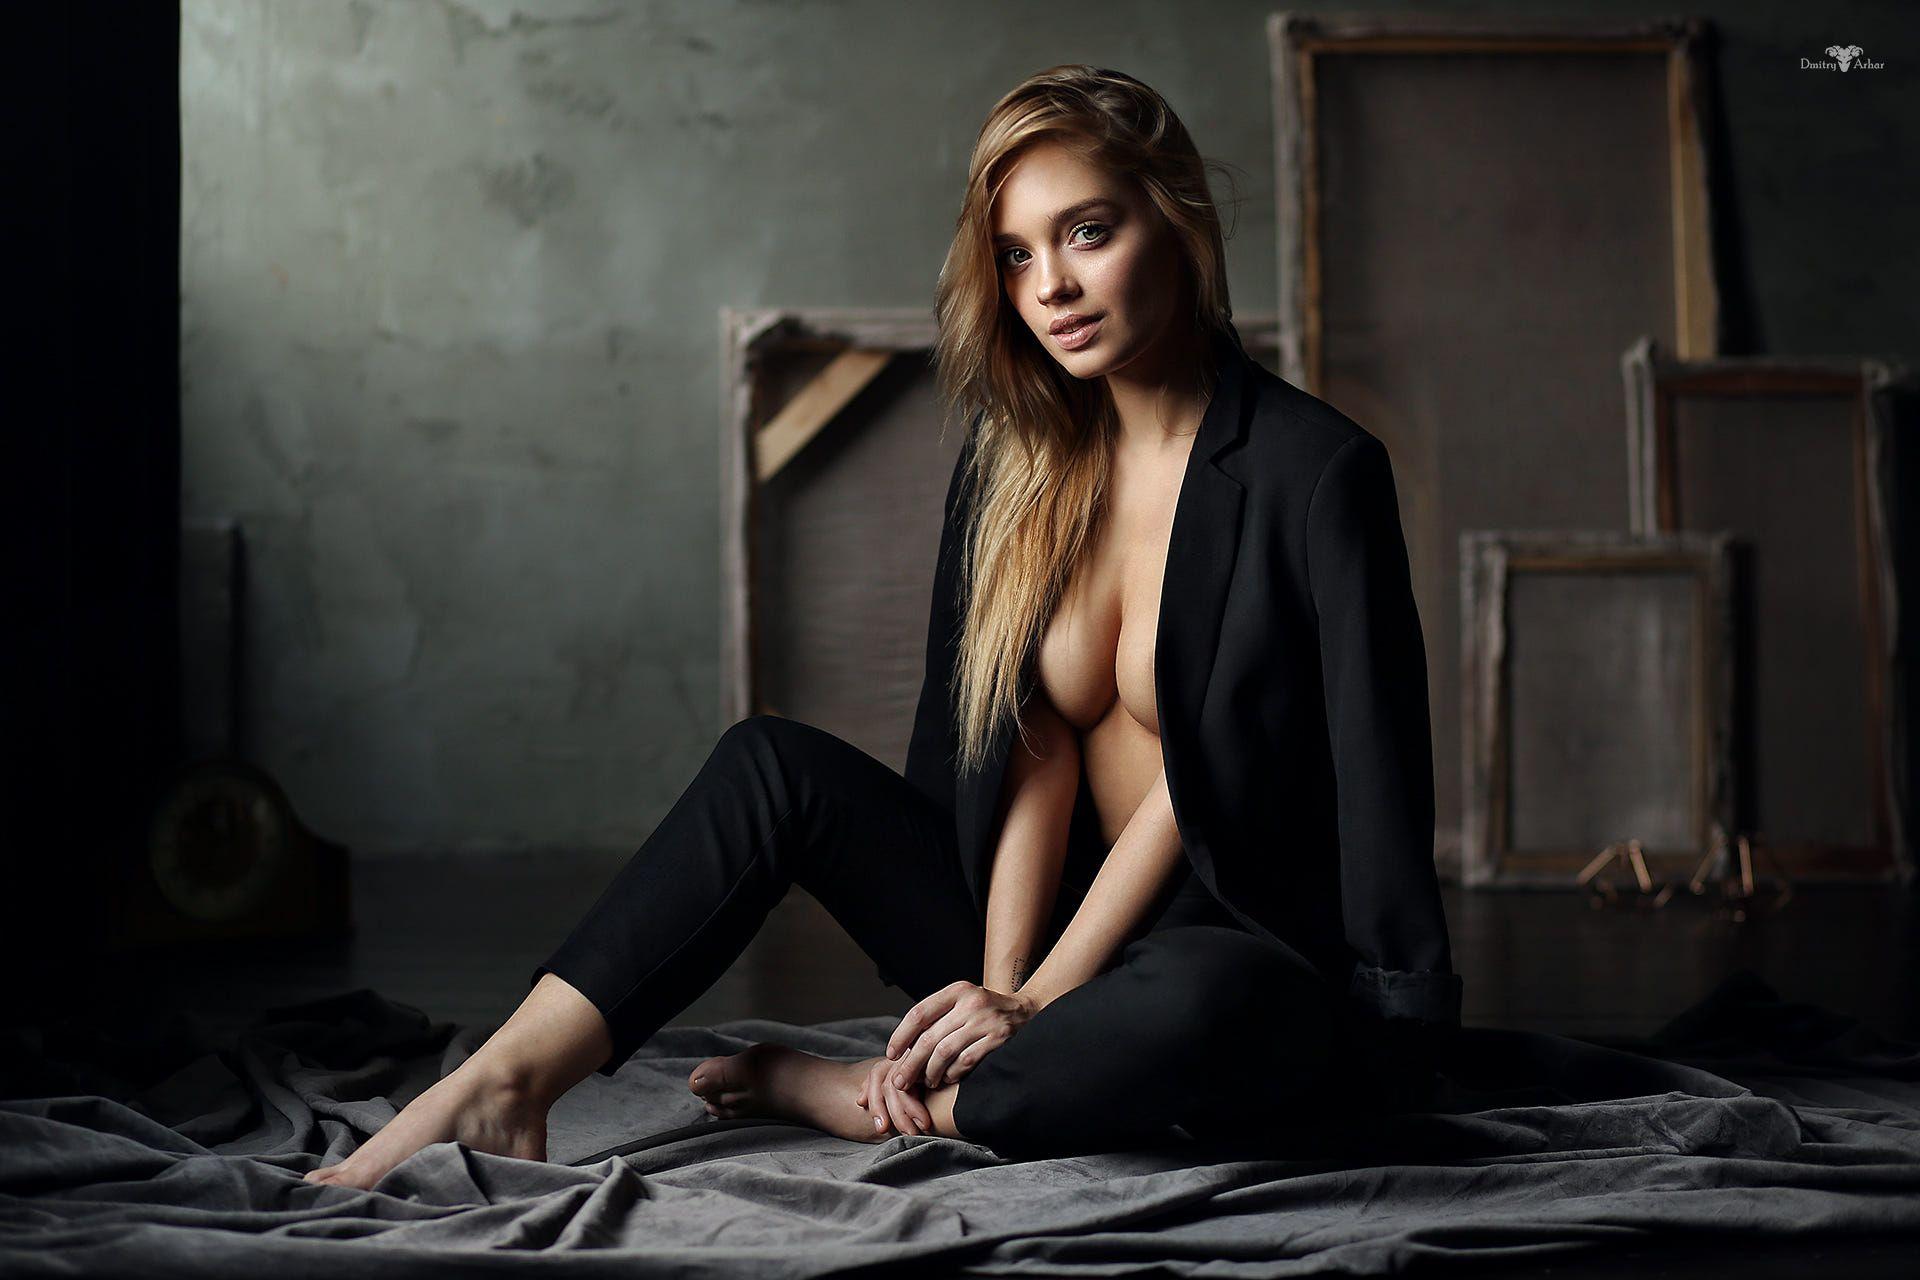 Instagram Iza Olak nudes (73 photo), Ass, Fappening, Selfie, cleavage 2019